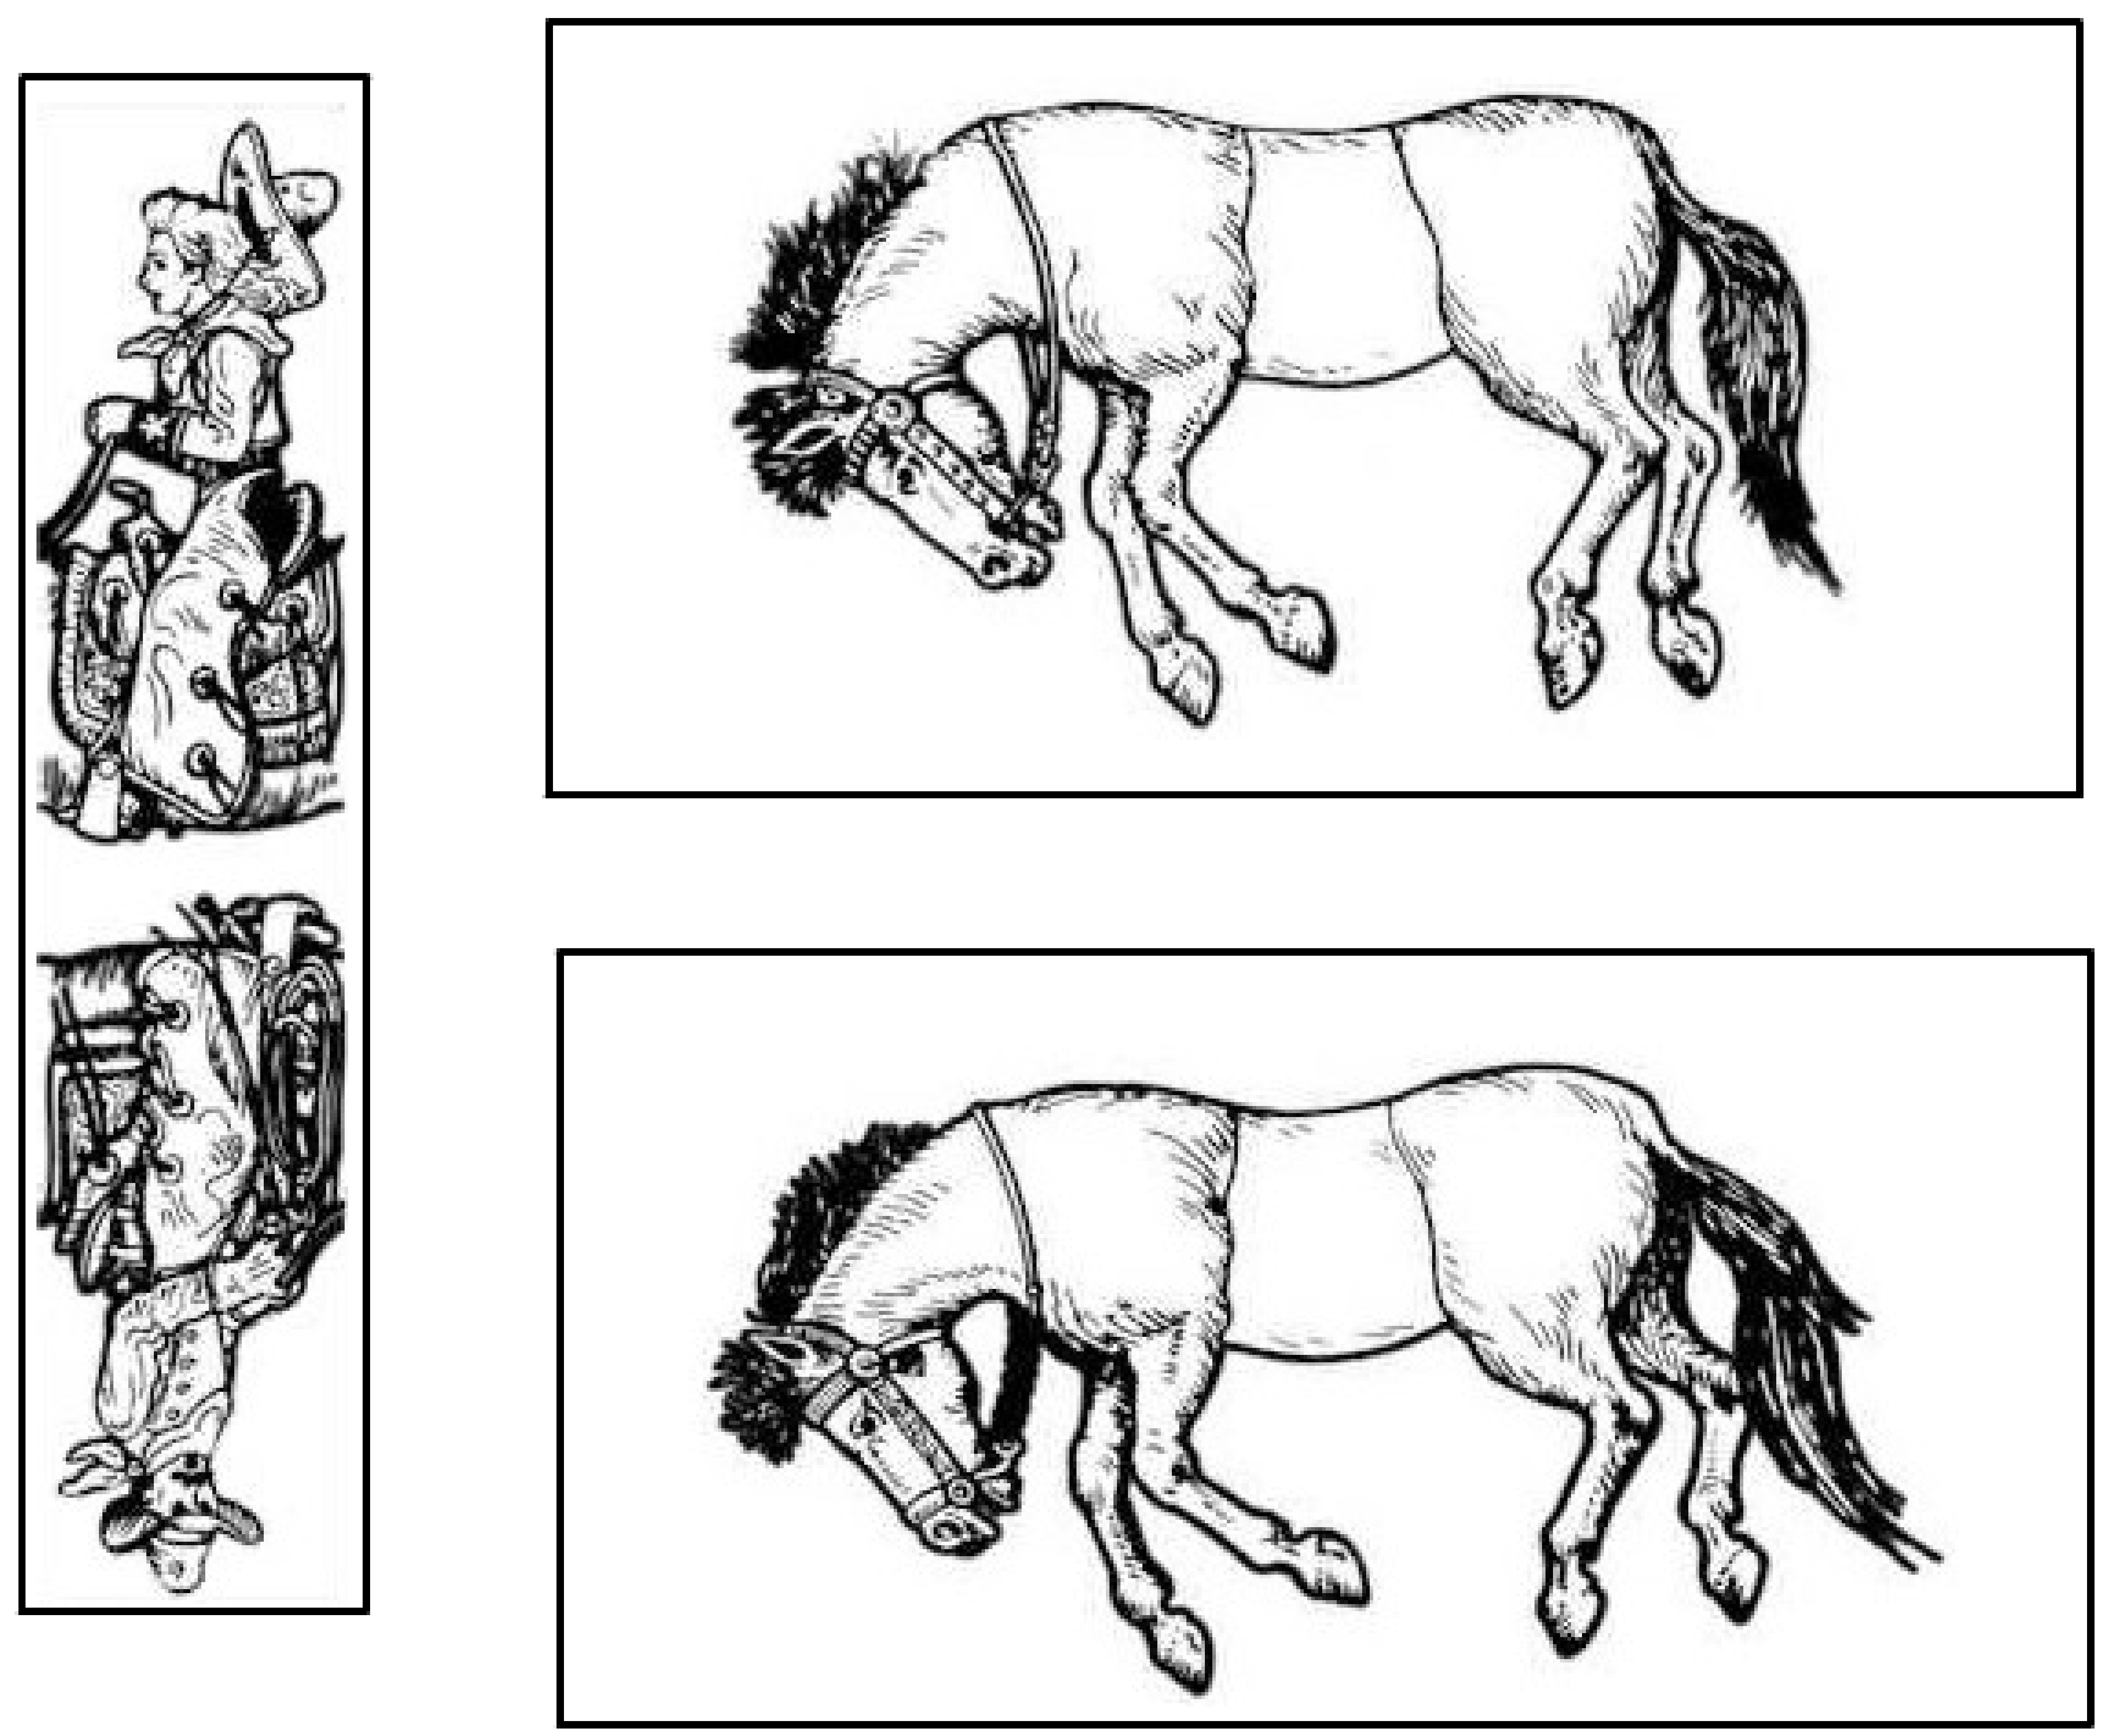 Uncategorized Horse Puzzle the famous trick donkeys a sam loyd puzzle david richeson division by zero